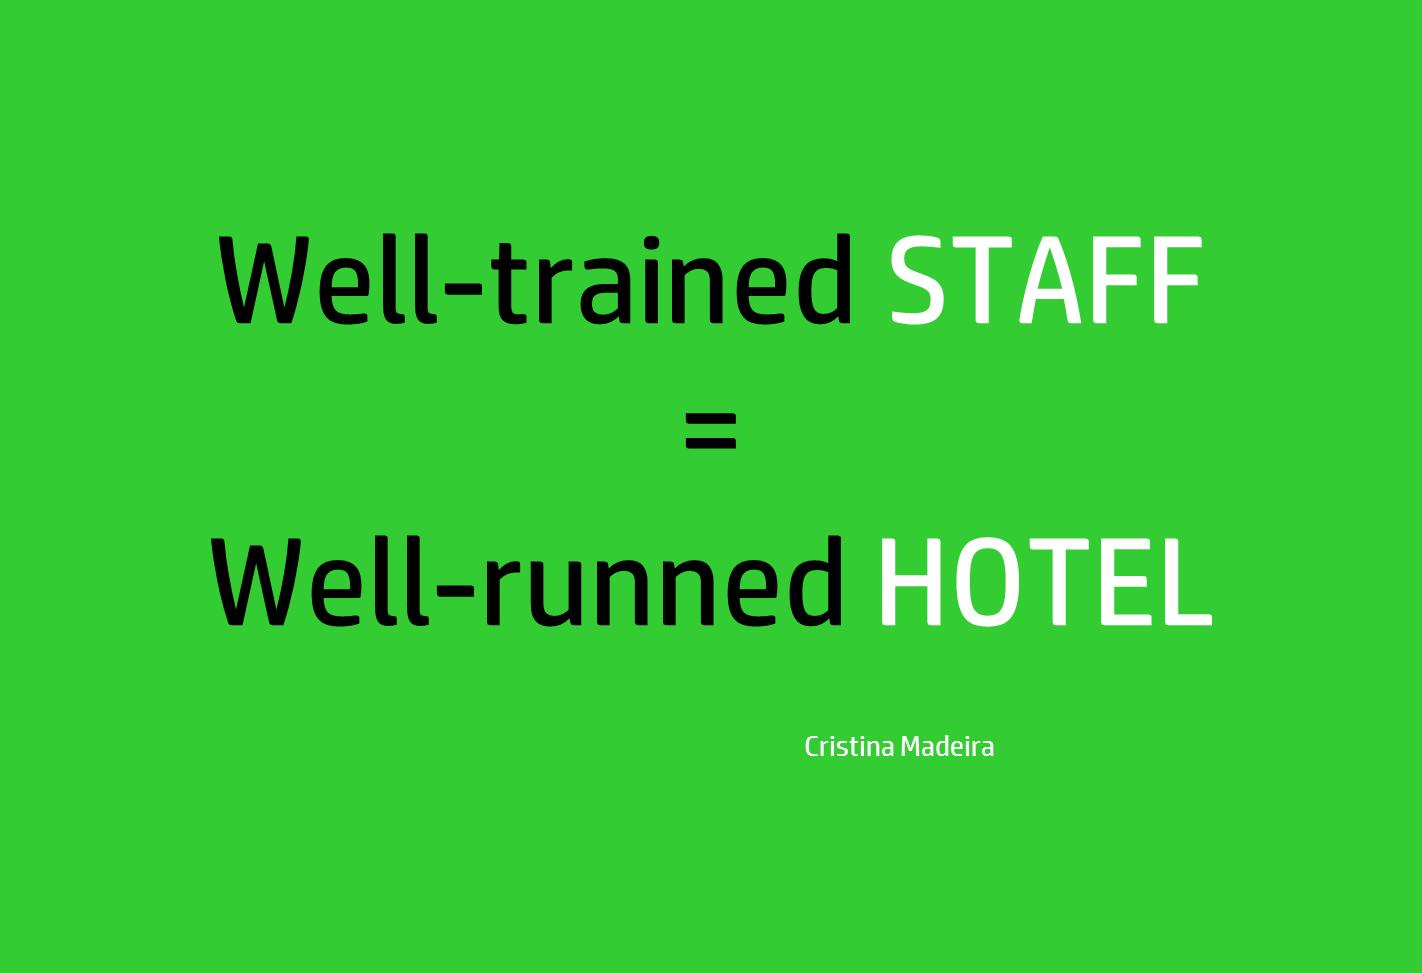 Cristina Madeira » Developing People, Skills and Behavior